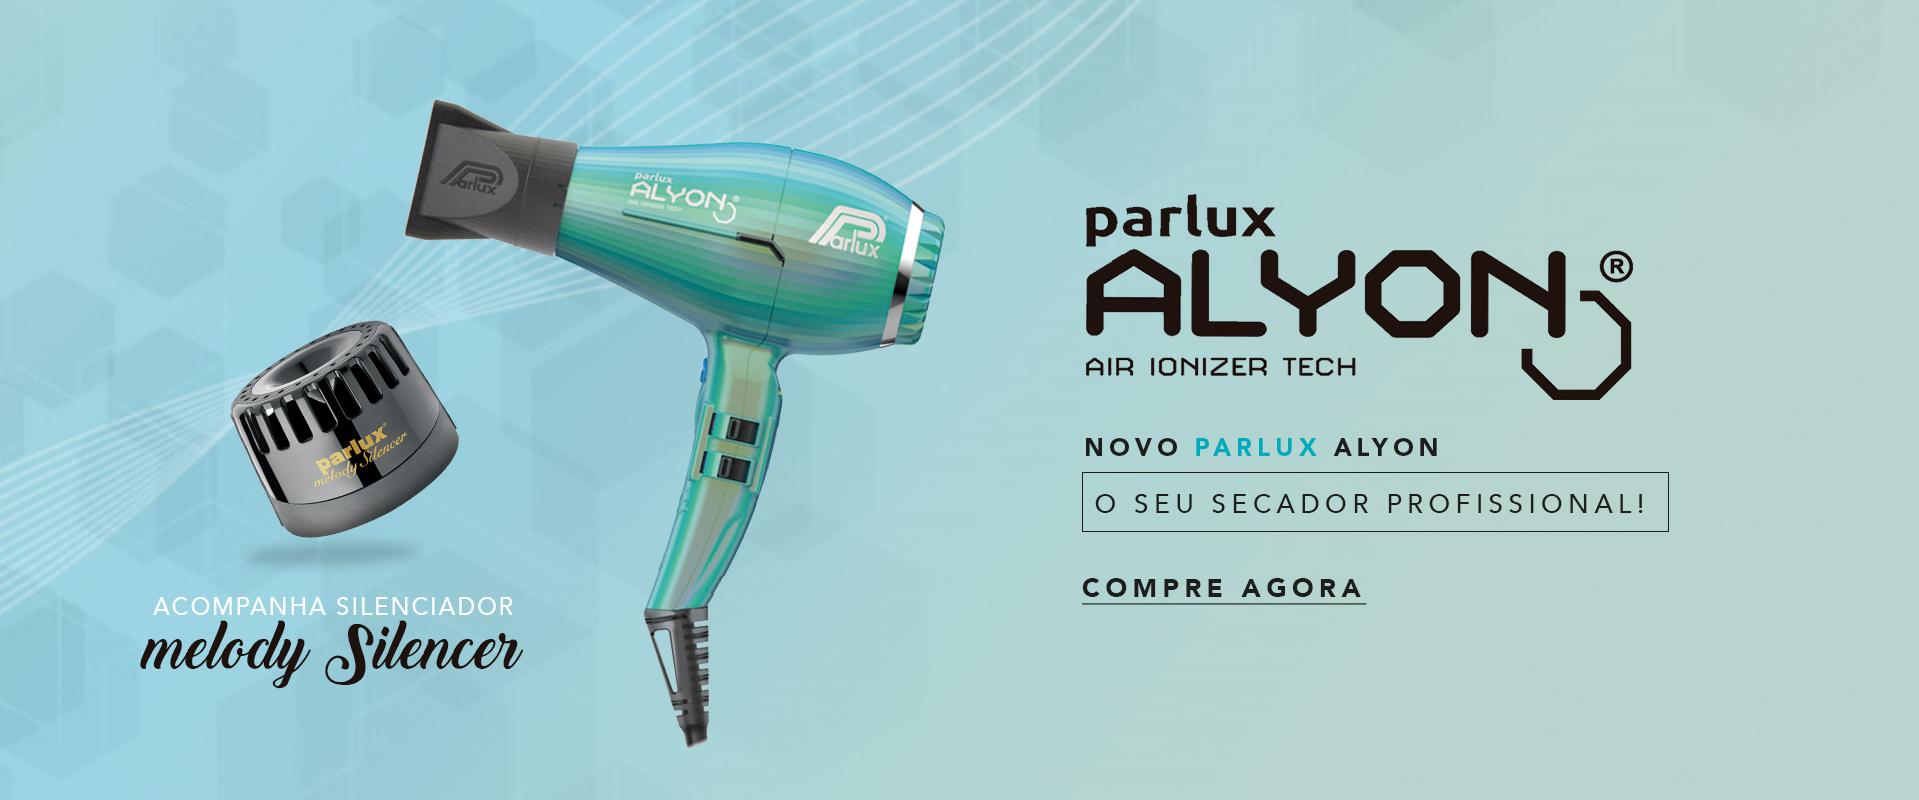 Novo Parlux Alyon